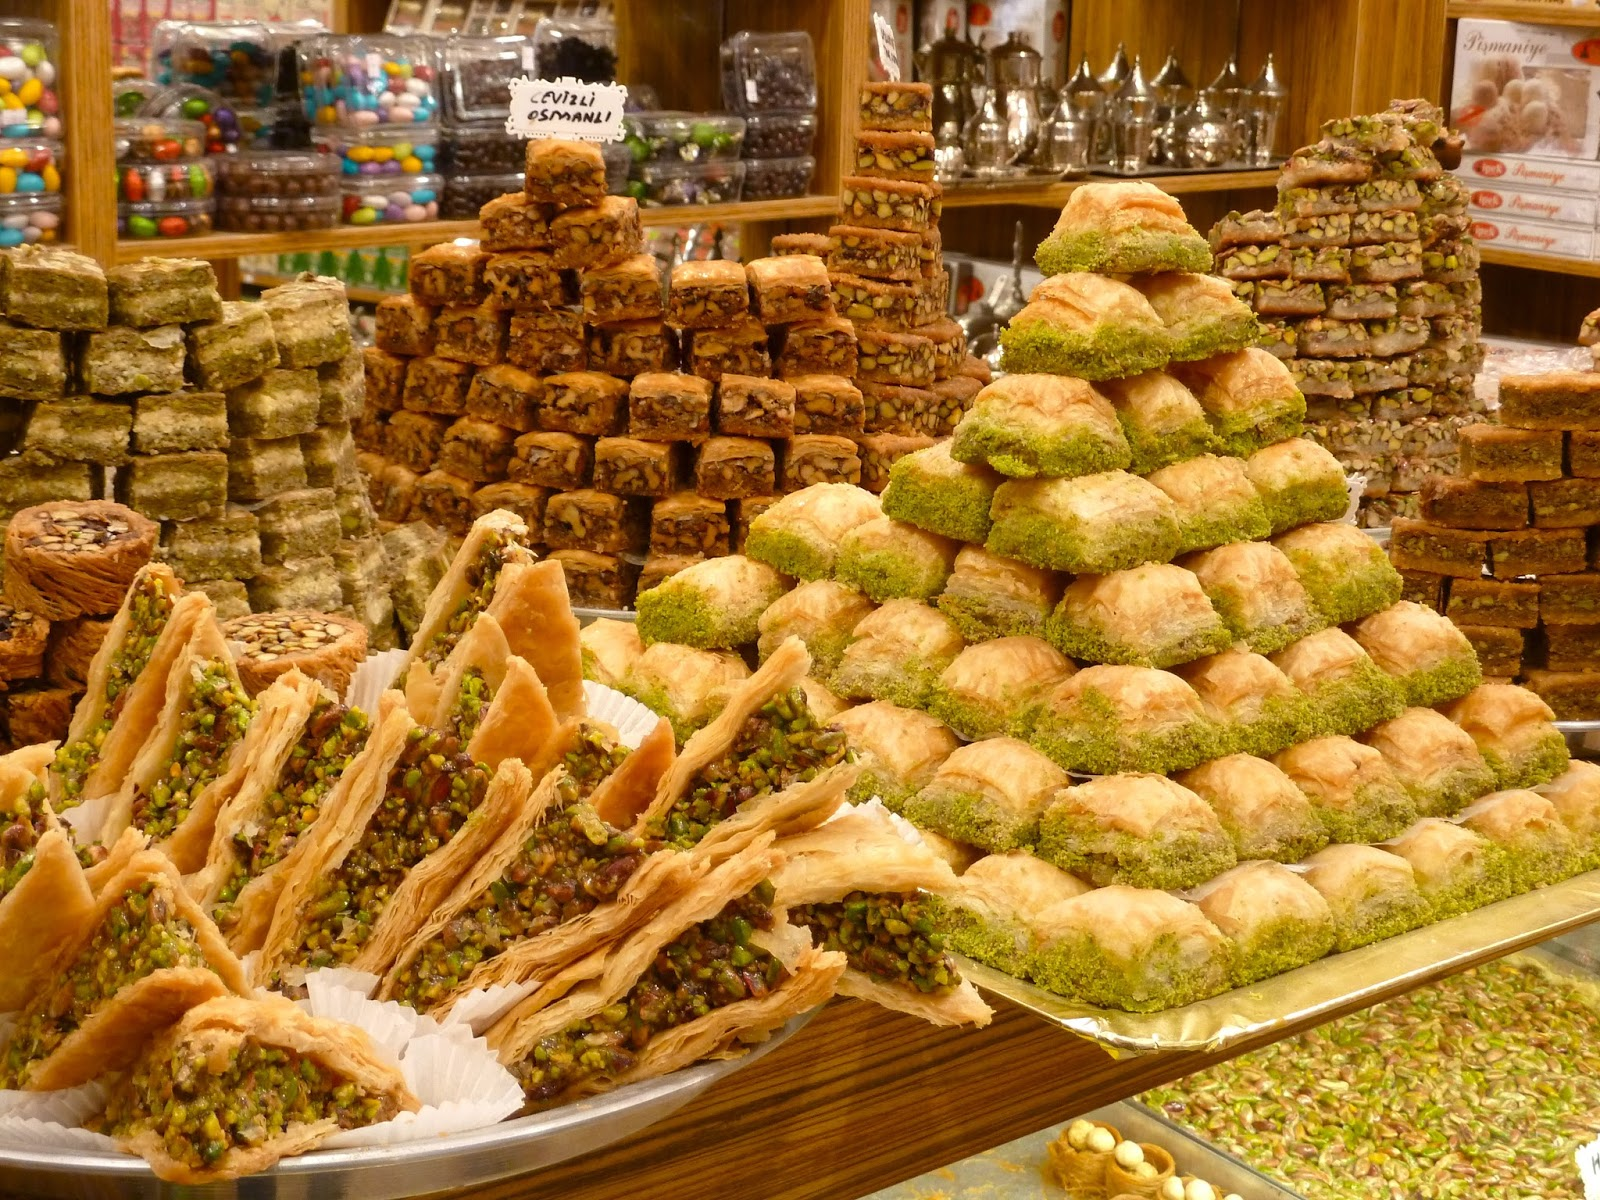 صور حلويات مغربيه , صور لاروع واطعم حلويات